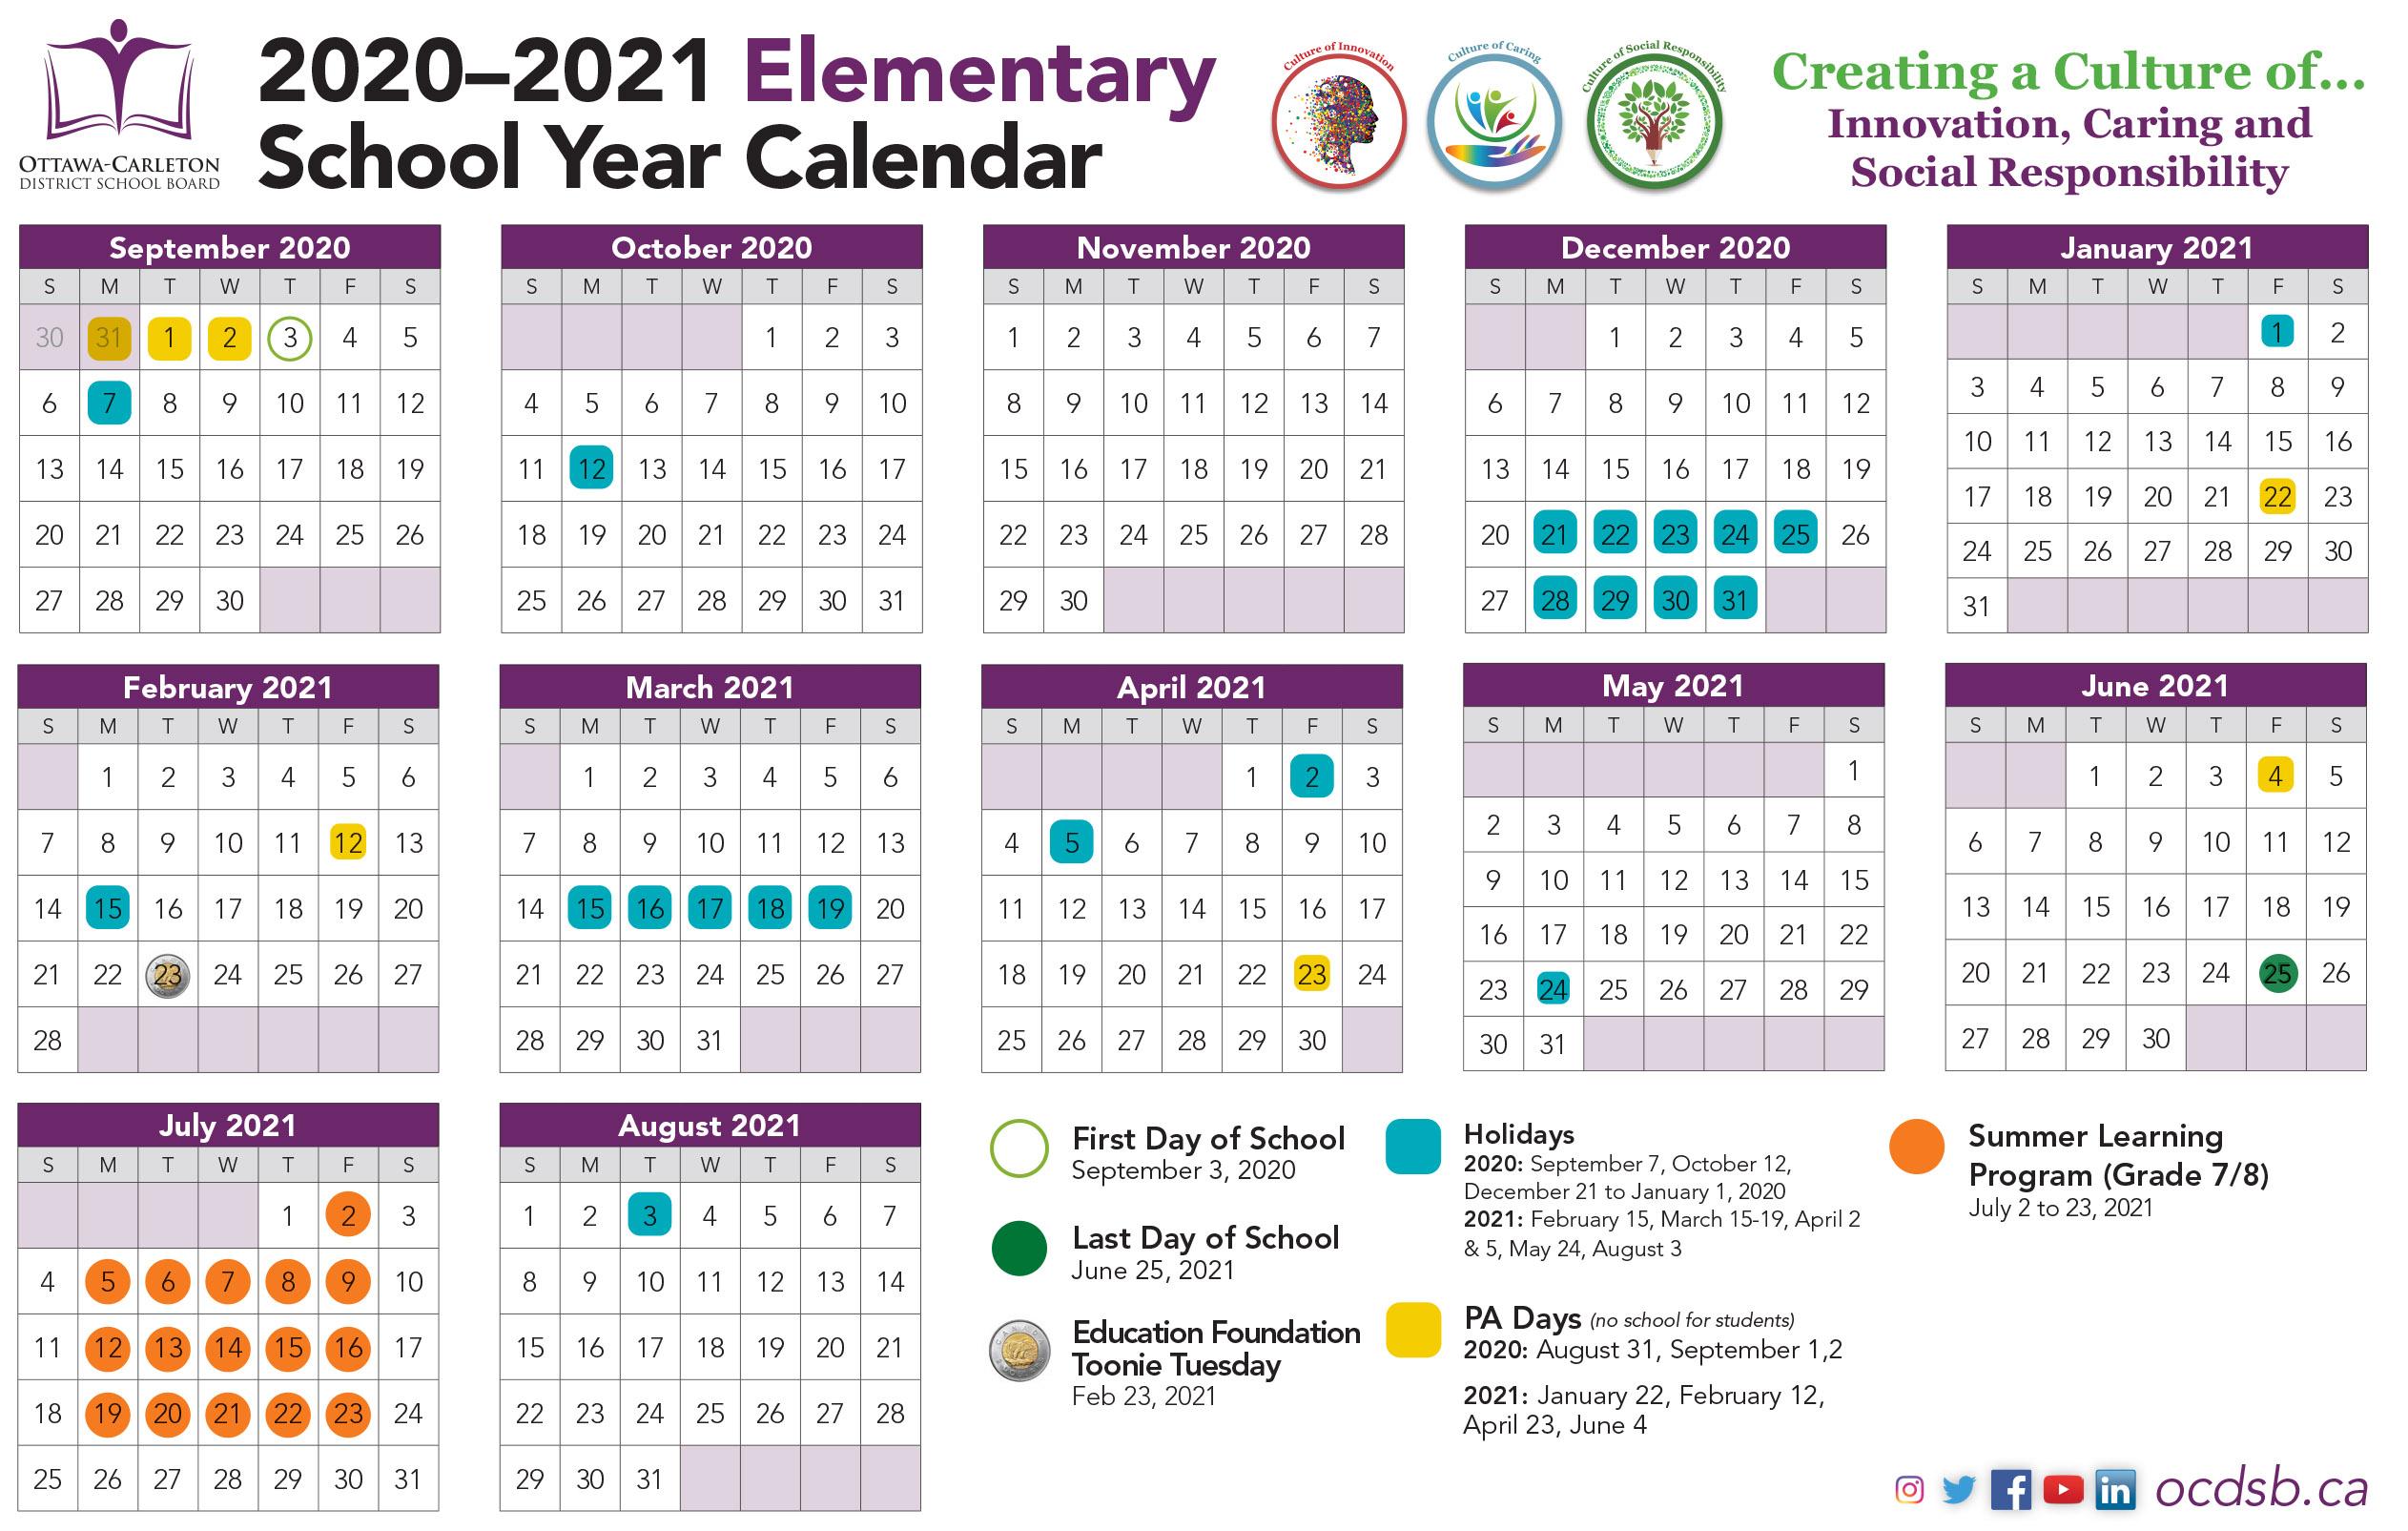 Public School Calendar 2021 | Printable Calendars 2021